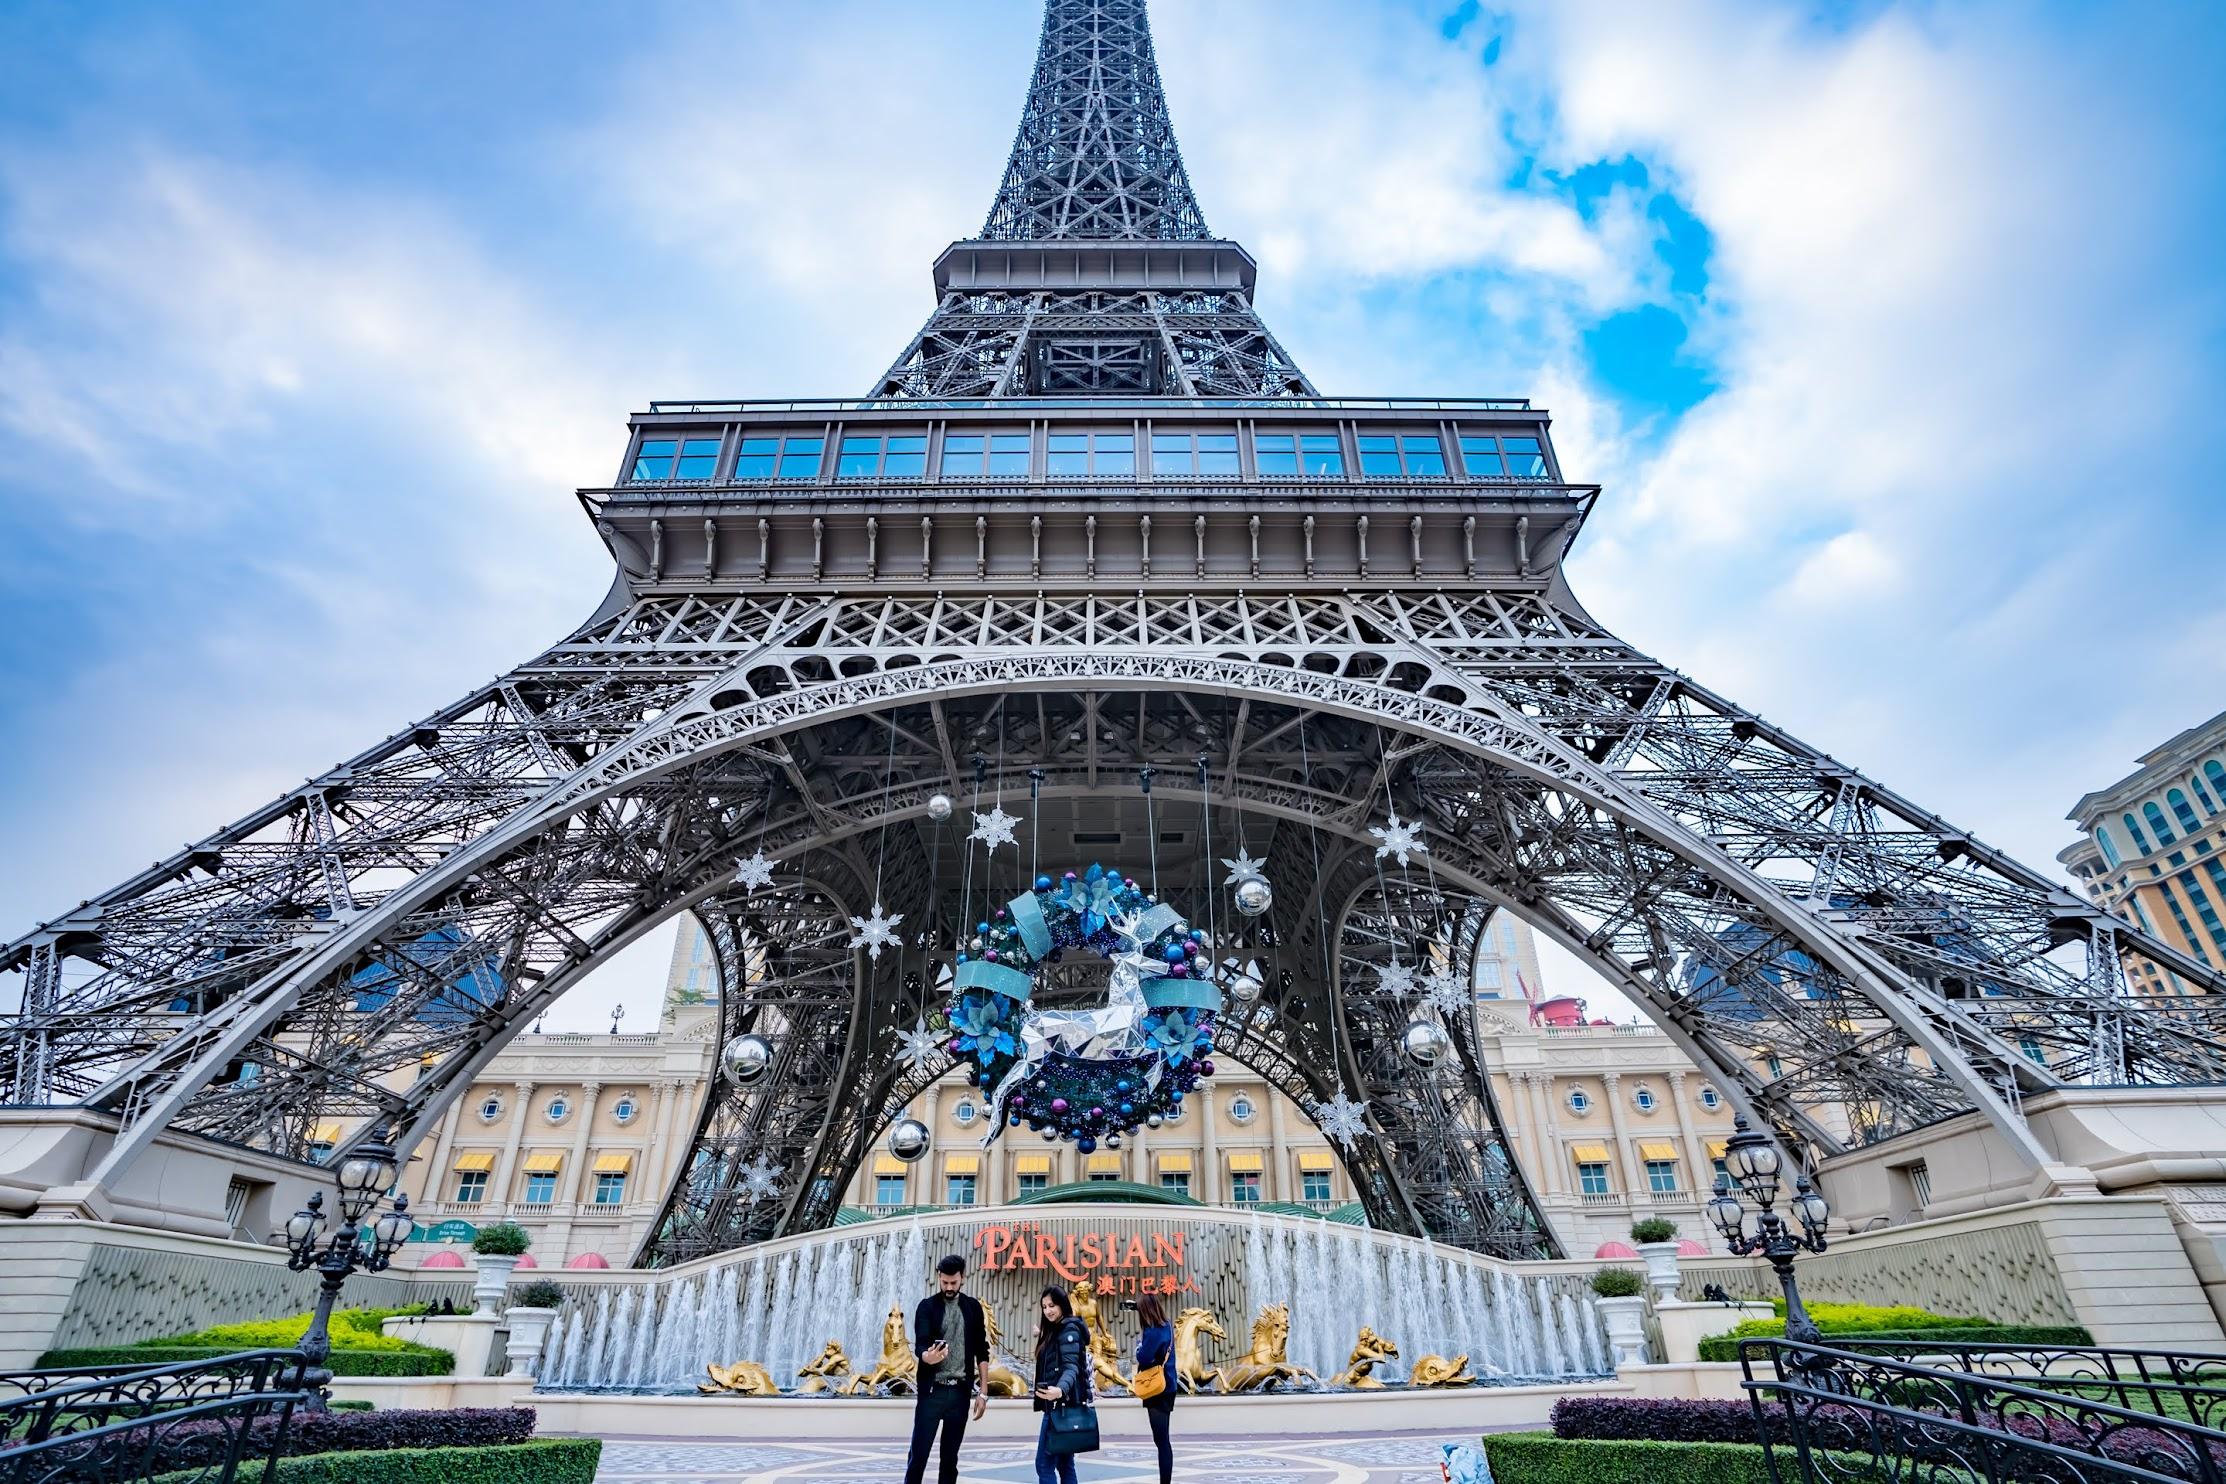 Parisian Macao Eiffel Tower2